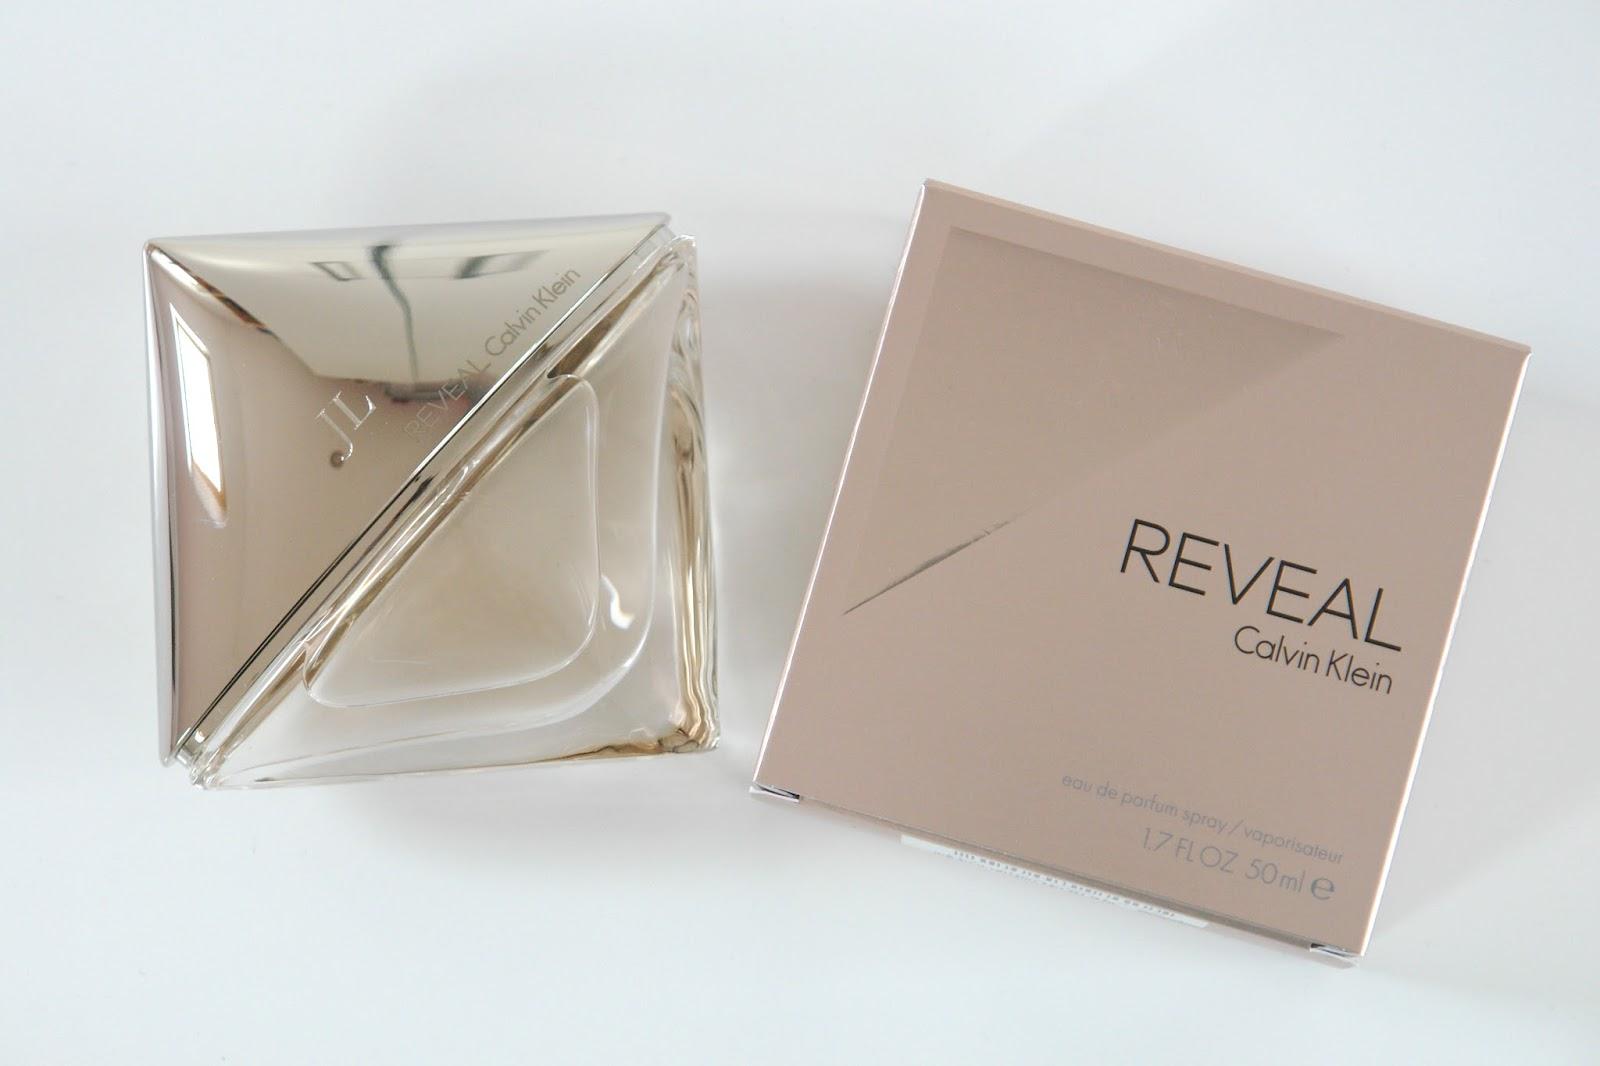 Calvin Klein Reveal perfume review